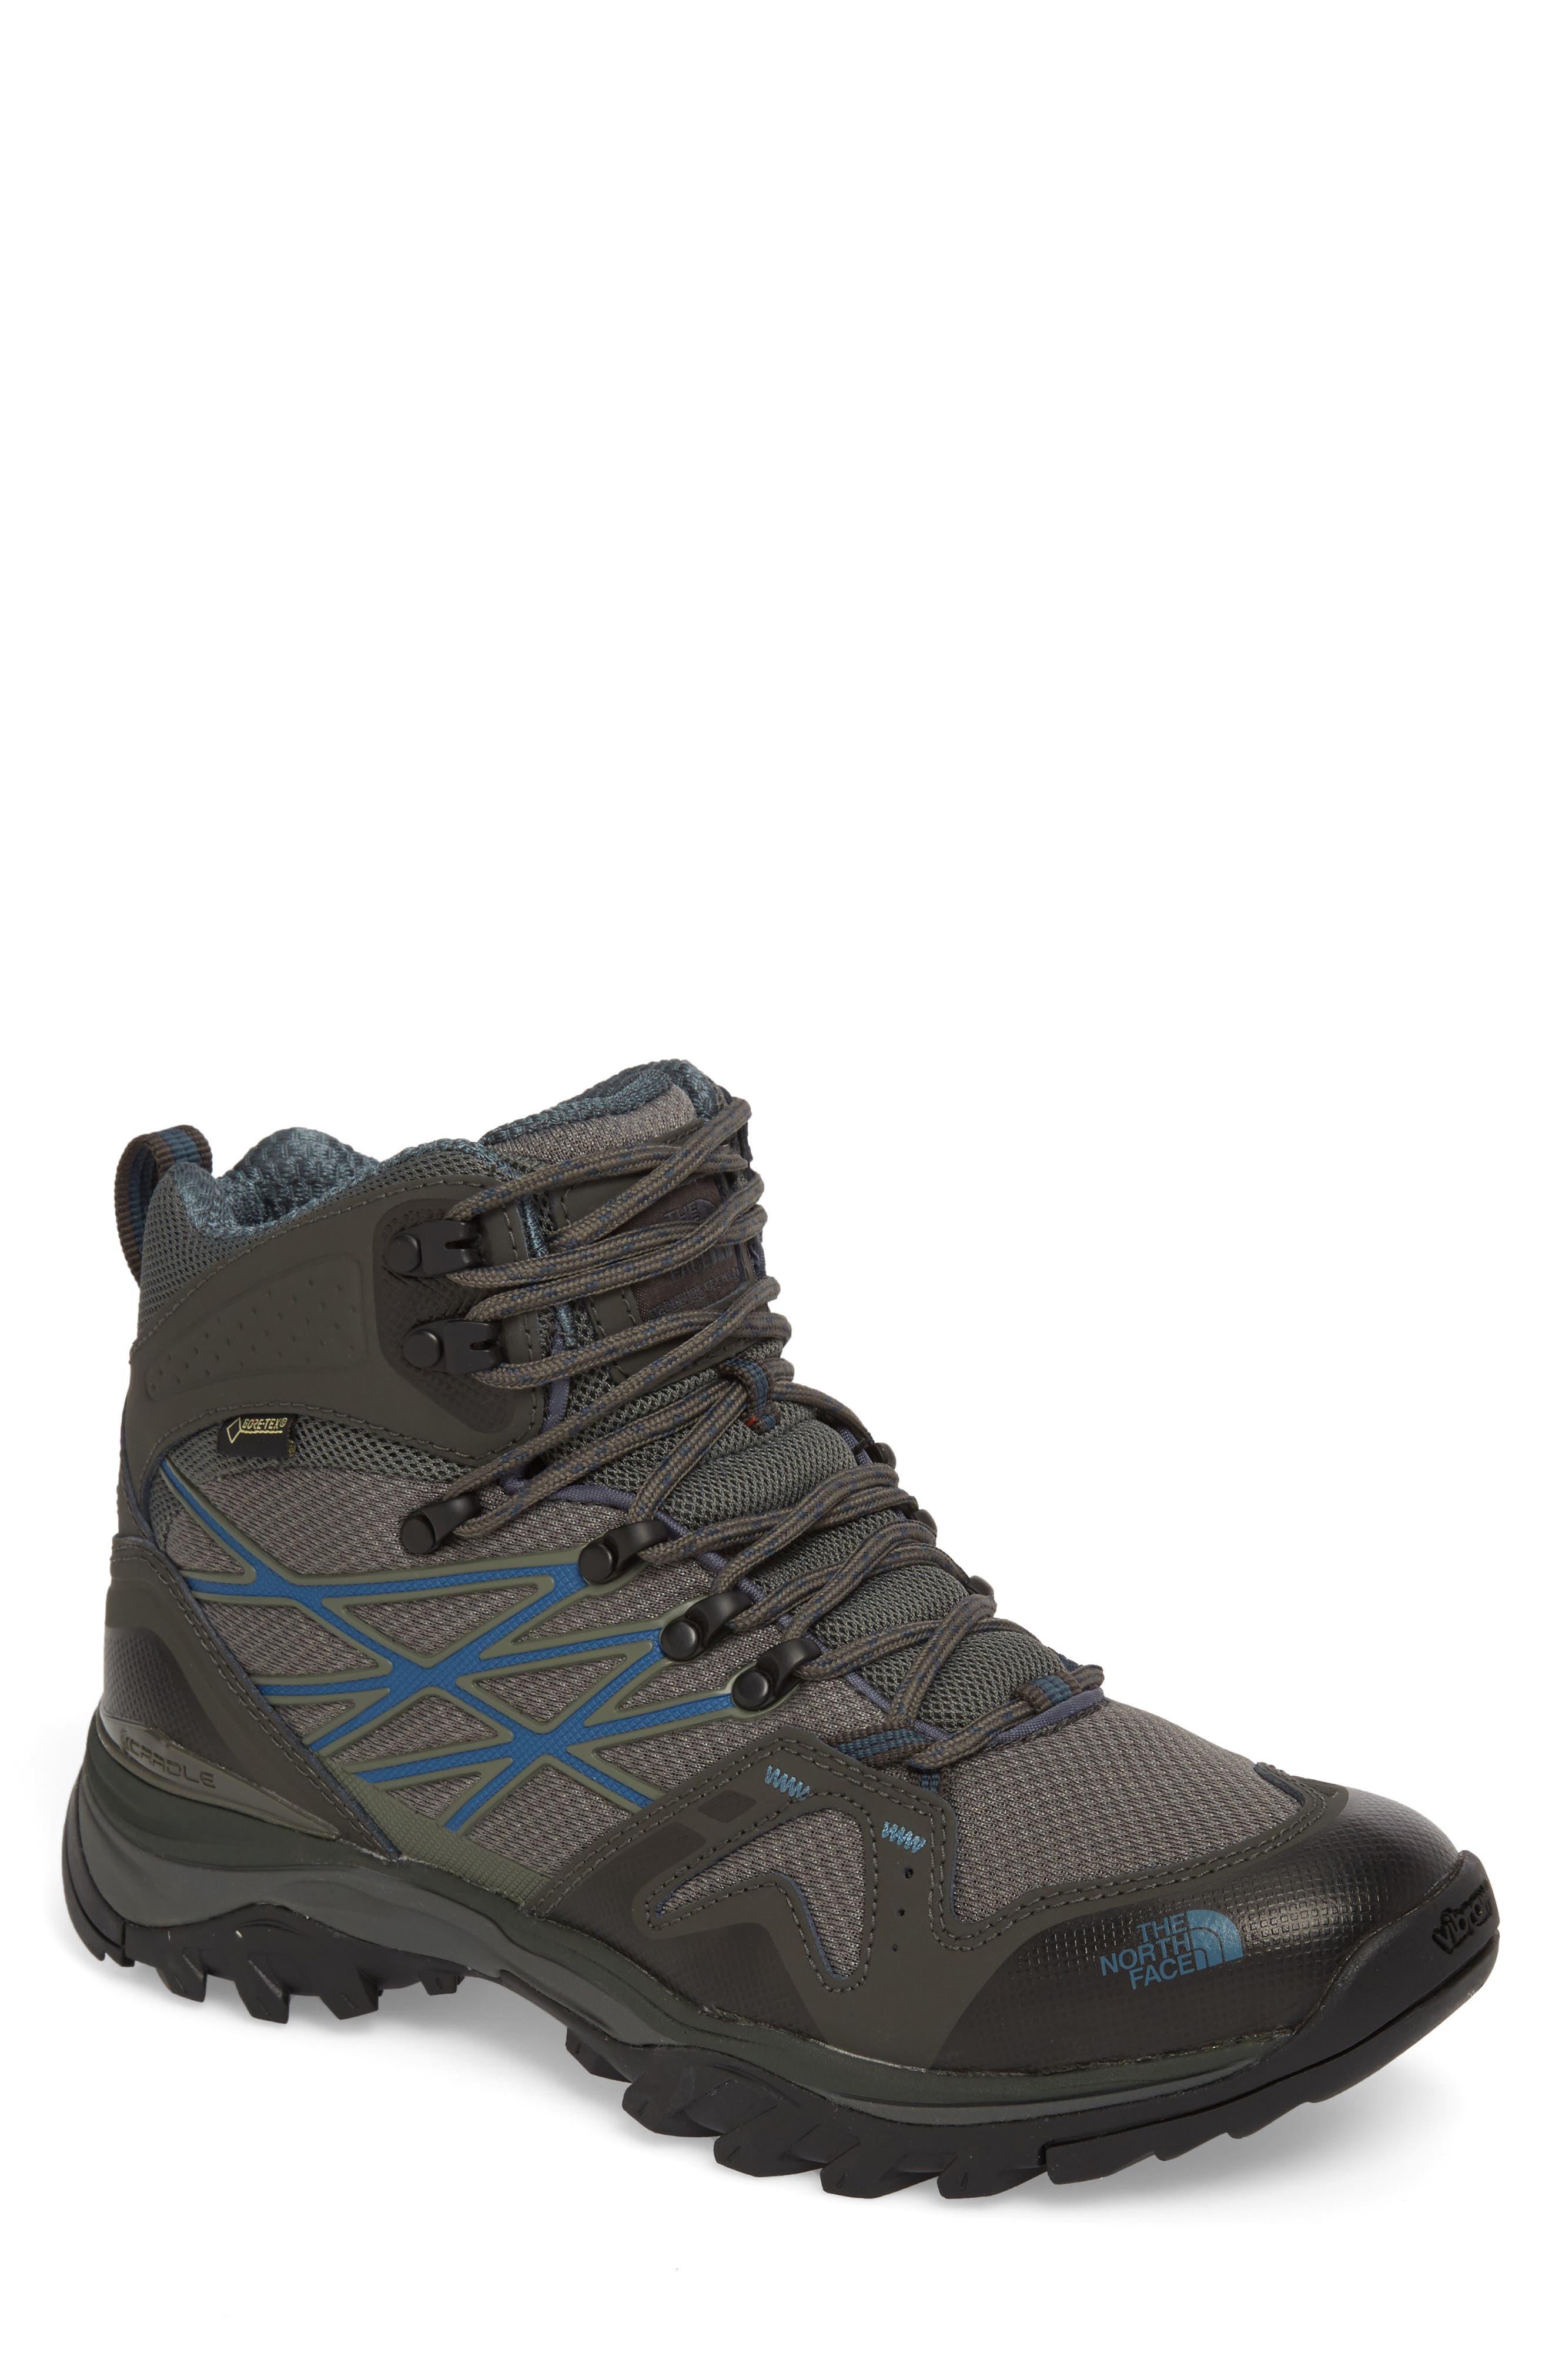 The North Face Hedgehog Fastpack Mid Gore-Tex® Waterproof Hiking Shoe (Men)